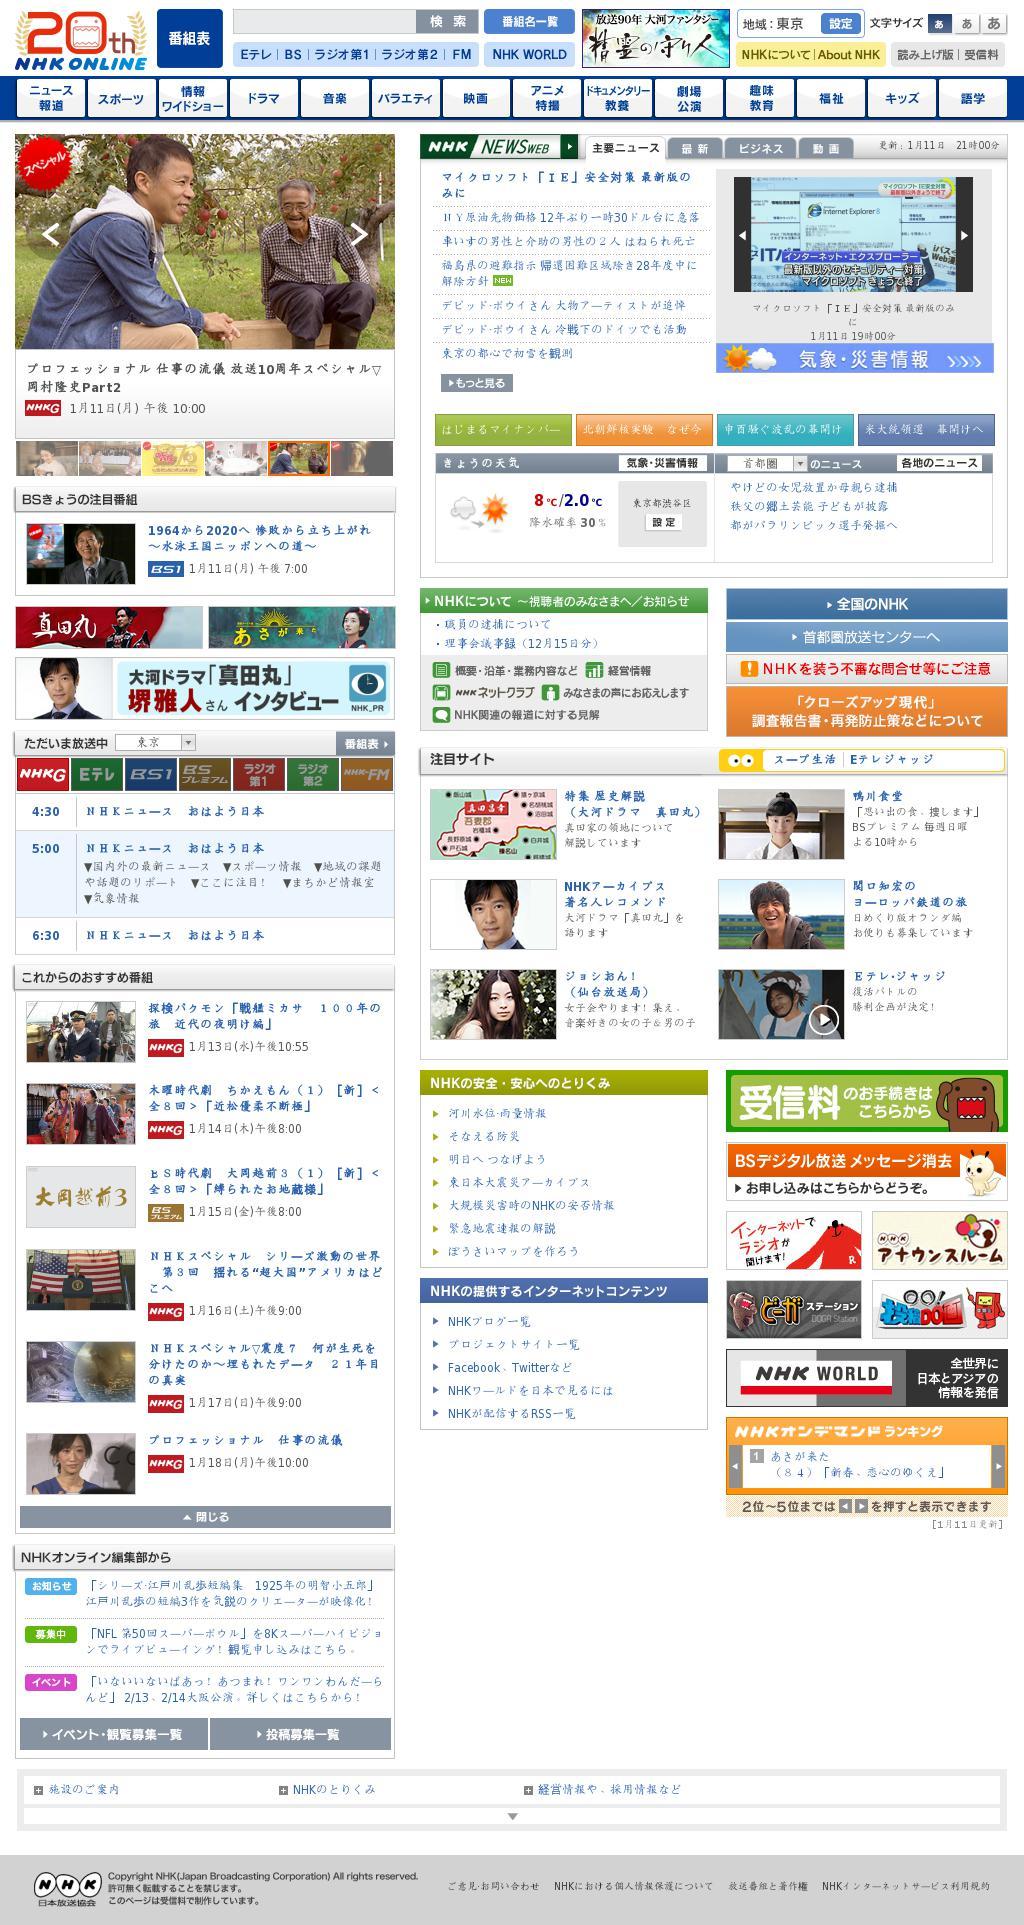 NHK Online at Monday Jan. 11, 2016, 9:16 p.m. UTC